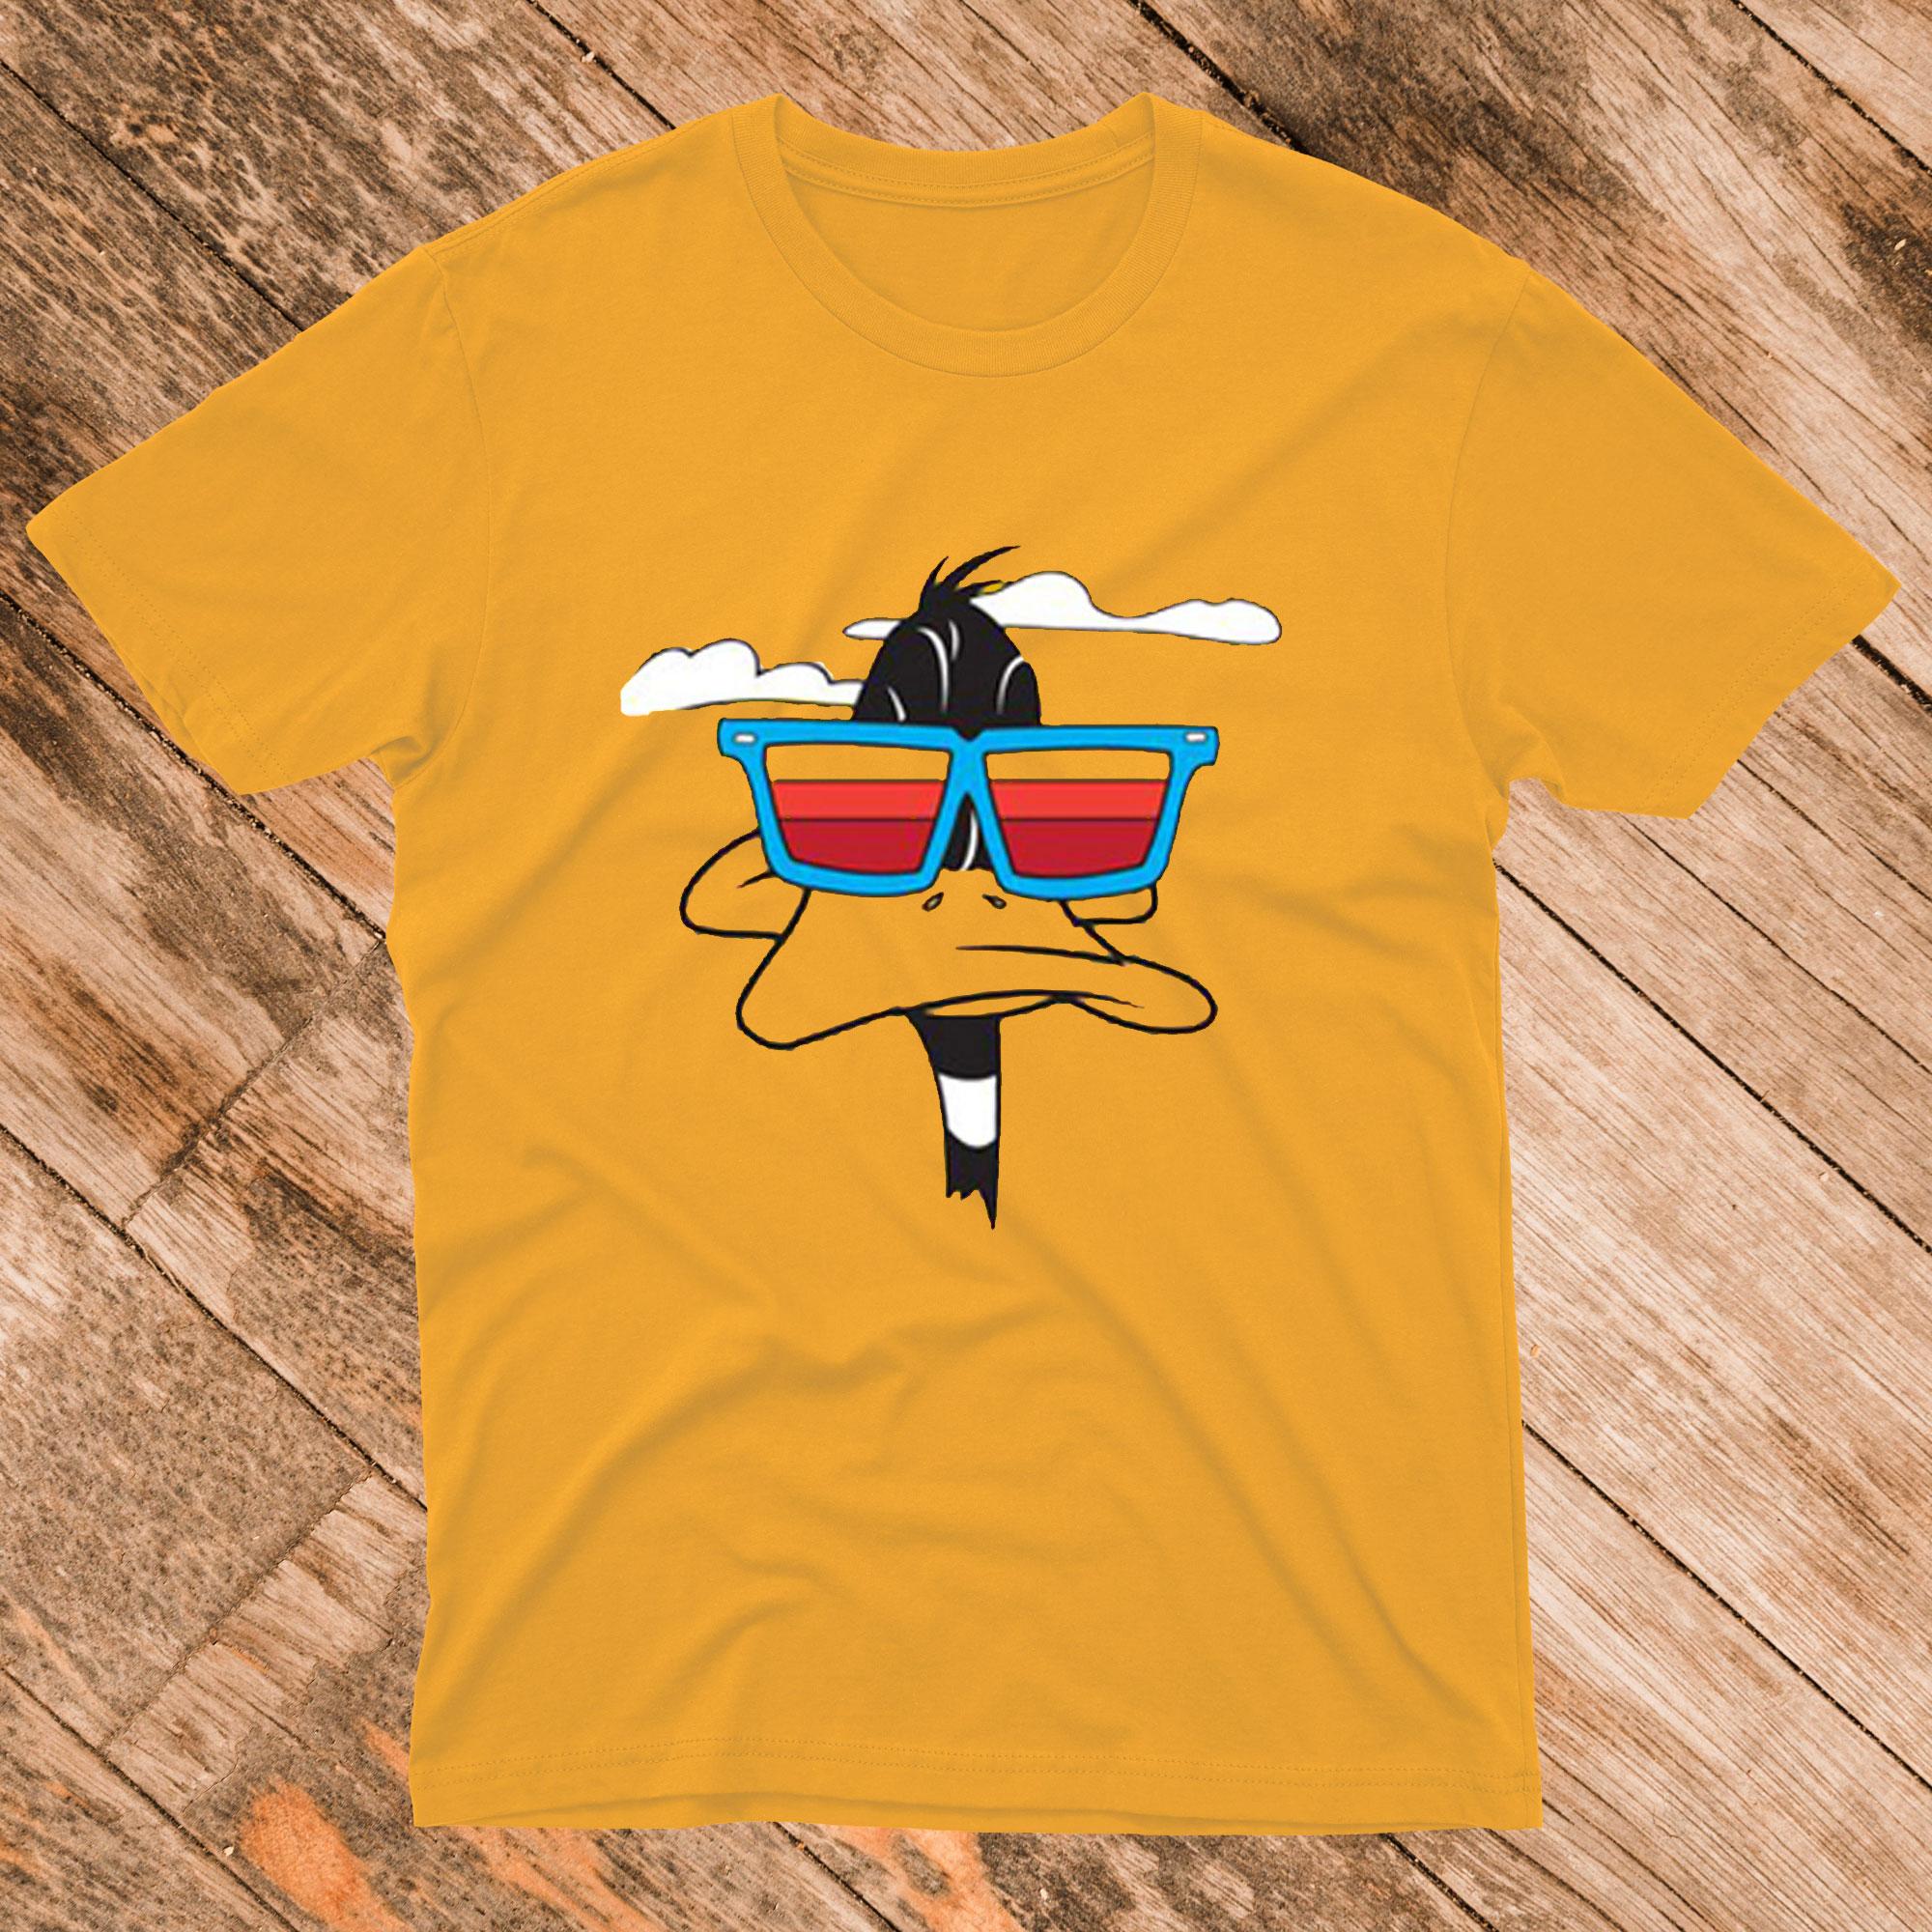 Daffy Ducks Fitted T-shirt Unisex Tshirt